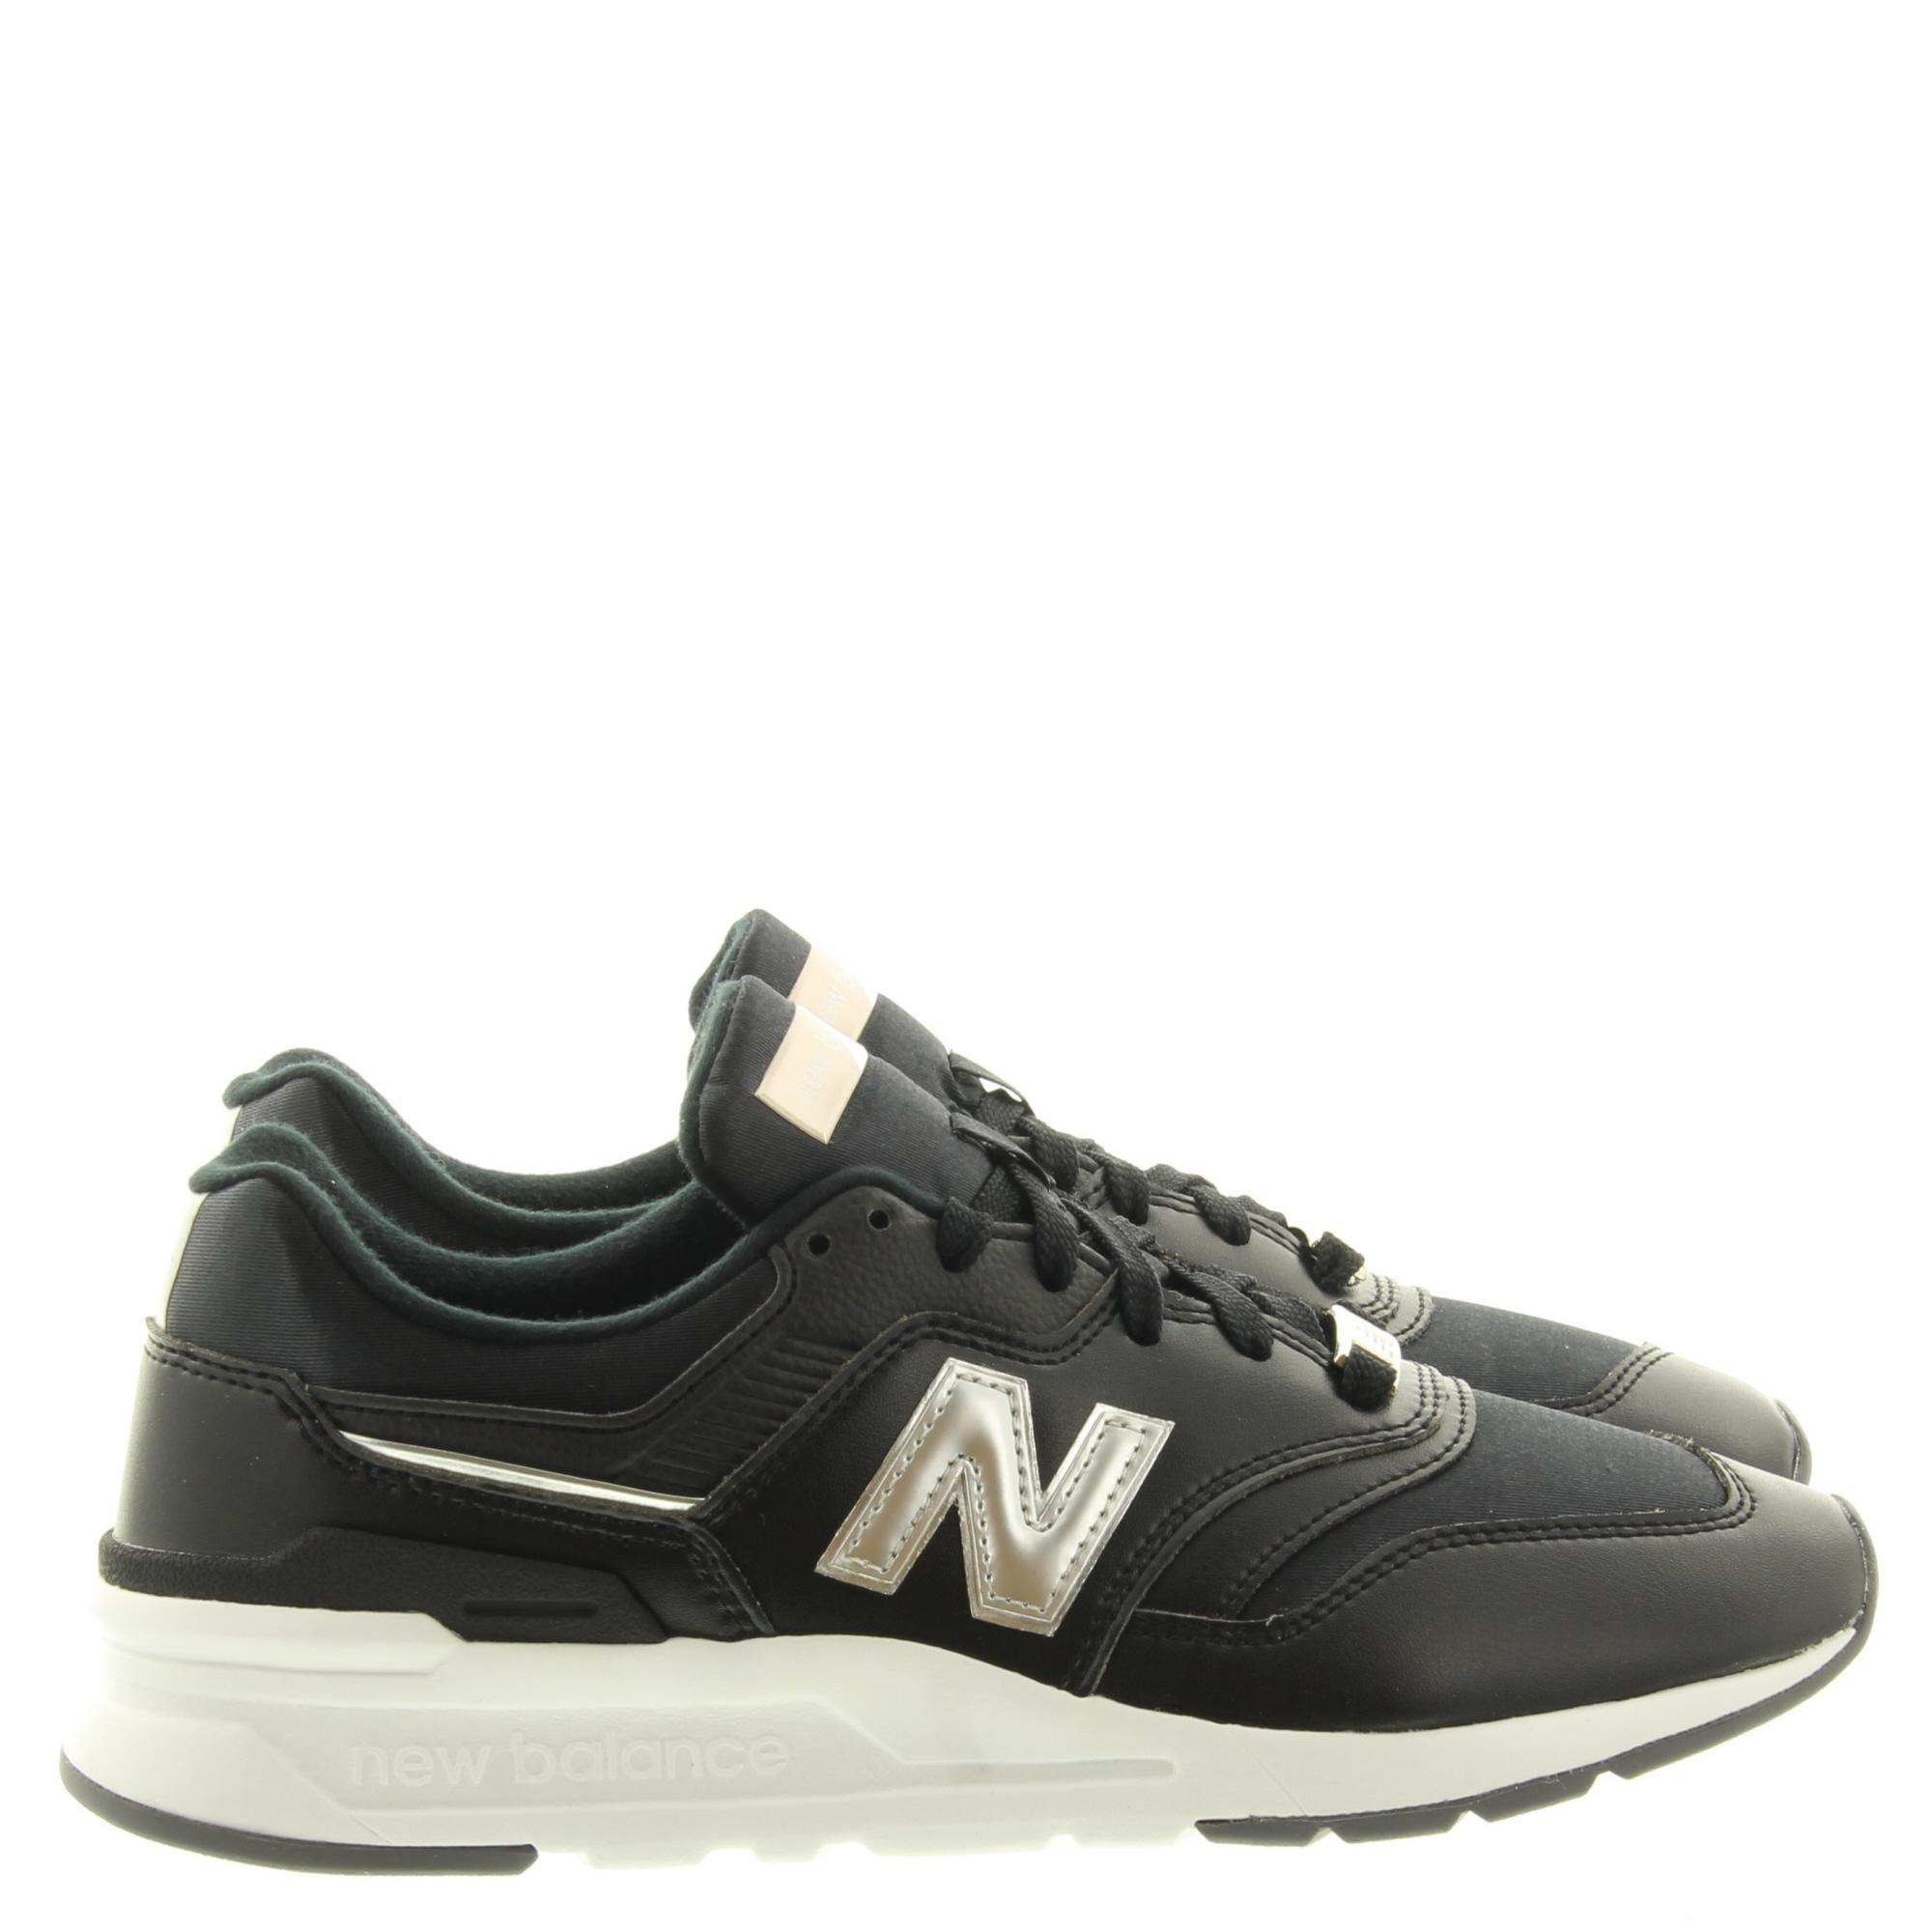 New Balance CW997HMK 048 Black/White